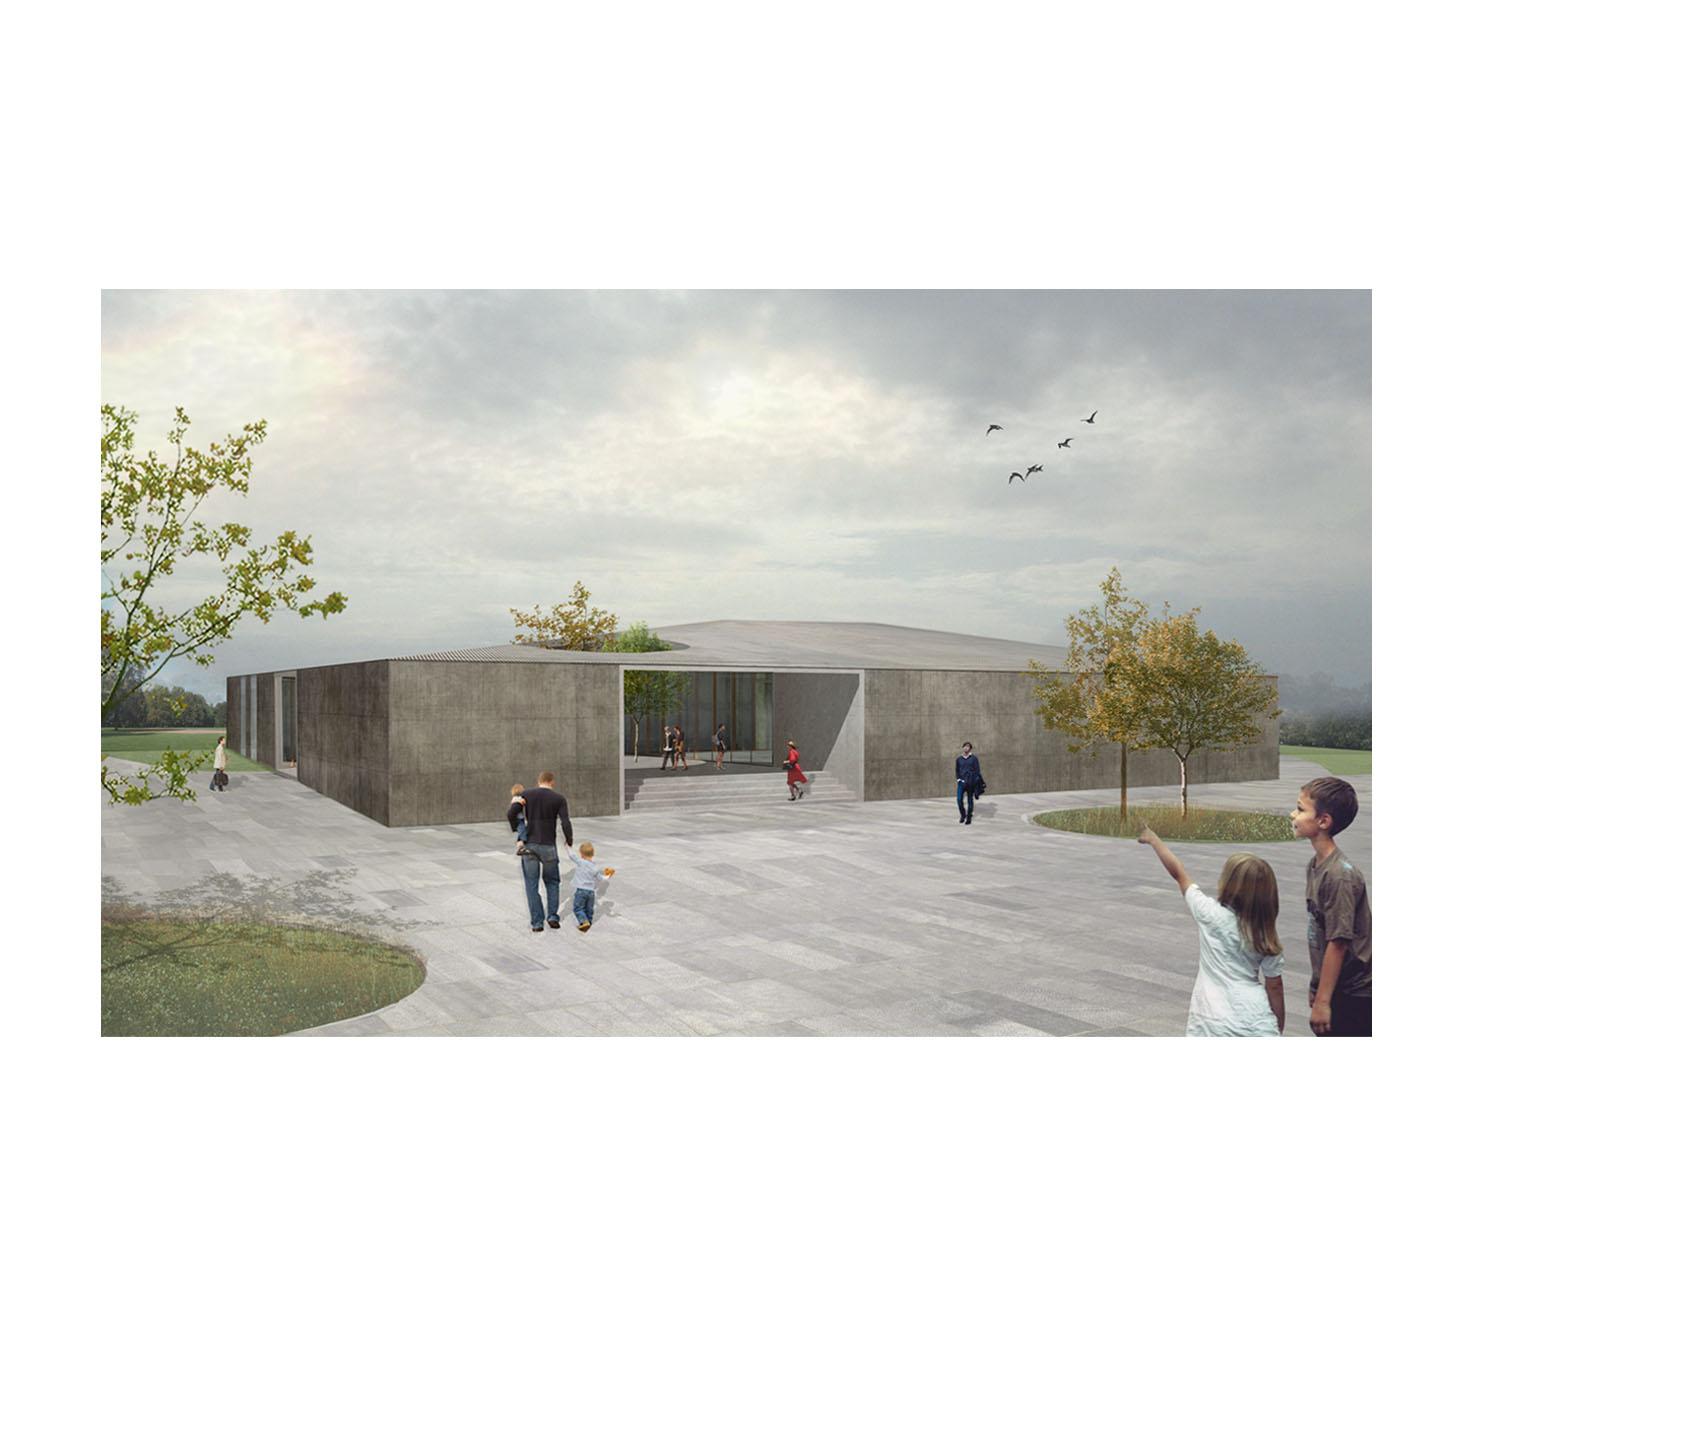 Auditorium-Grossbottwar-Image 01.jpg